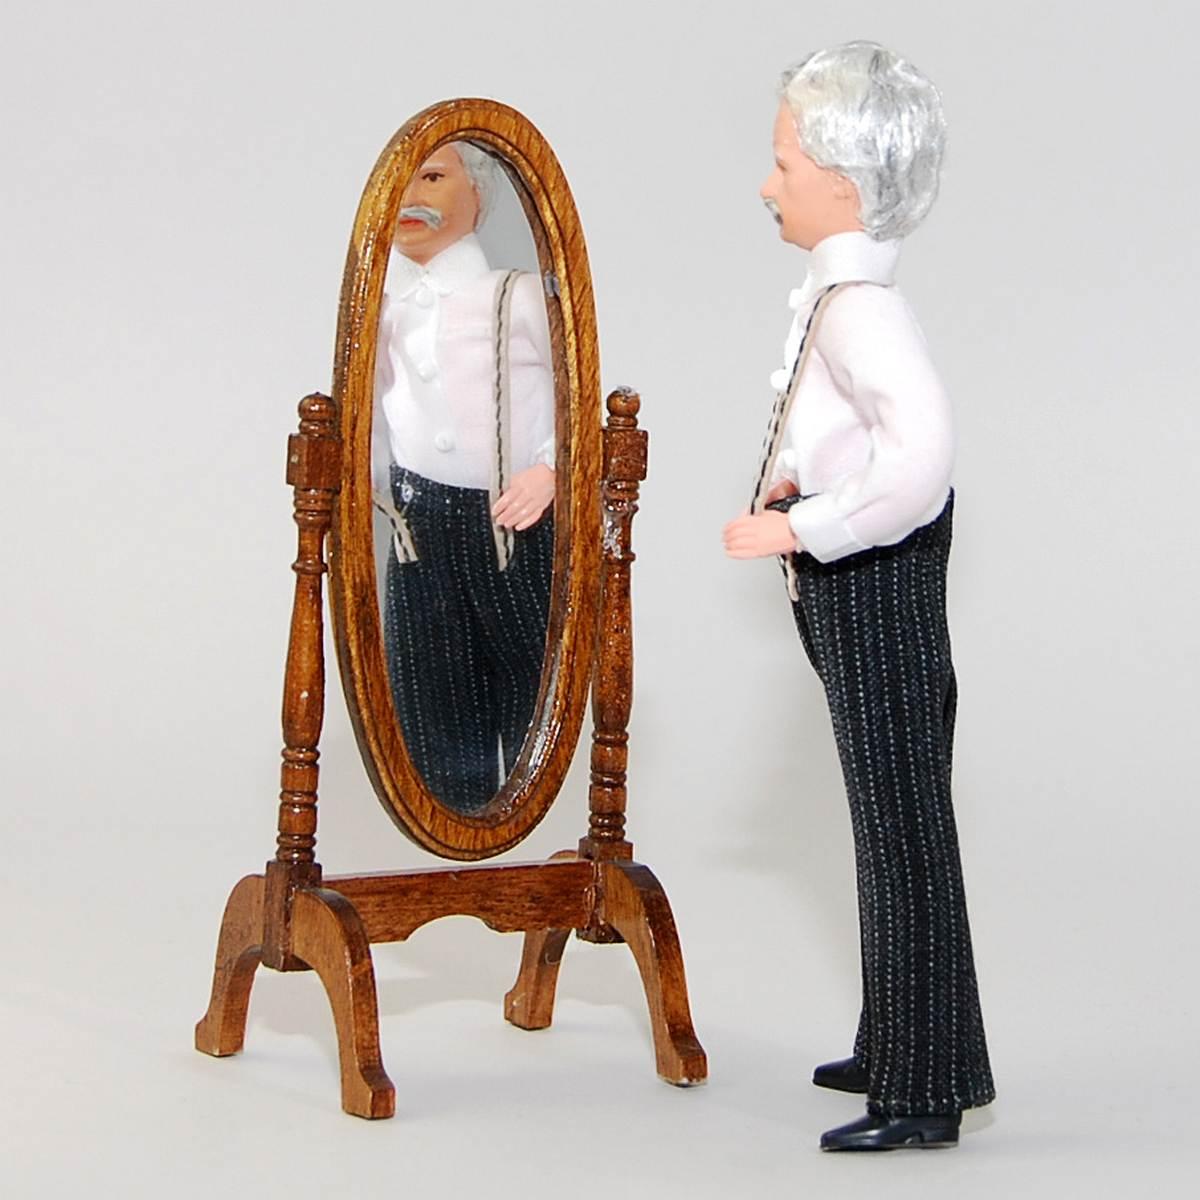 Grandpa with suspenders